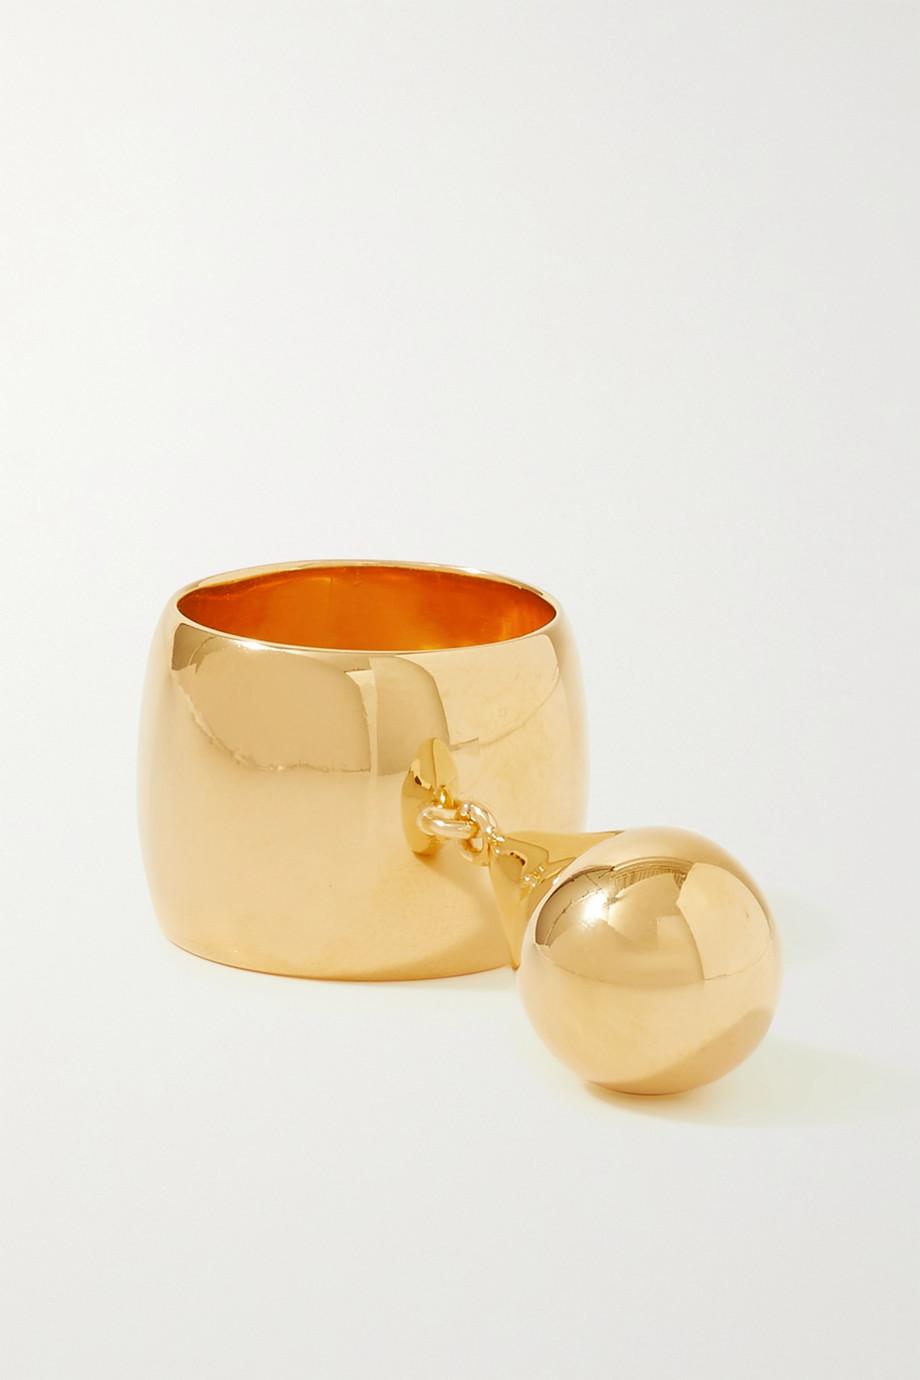 Sophie Buhai Gold vermeil ring